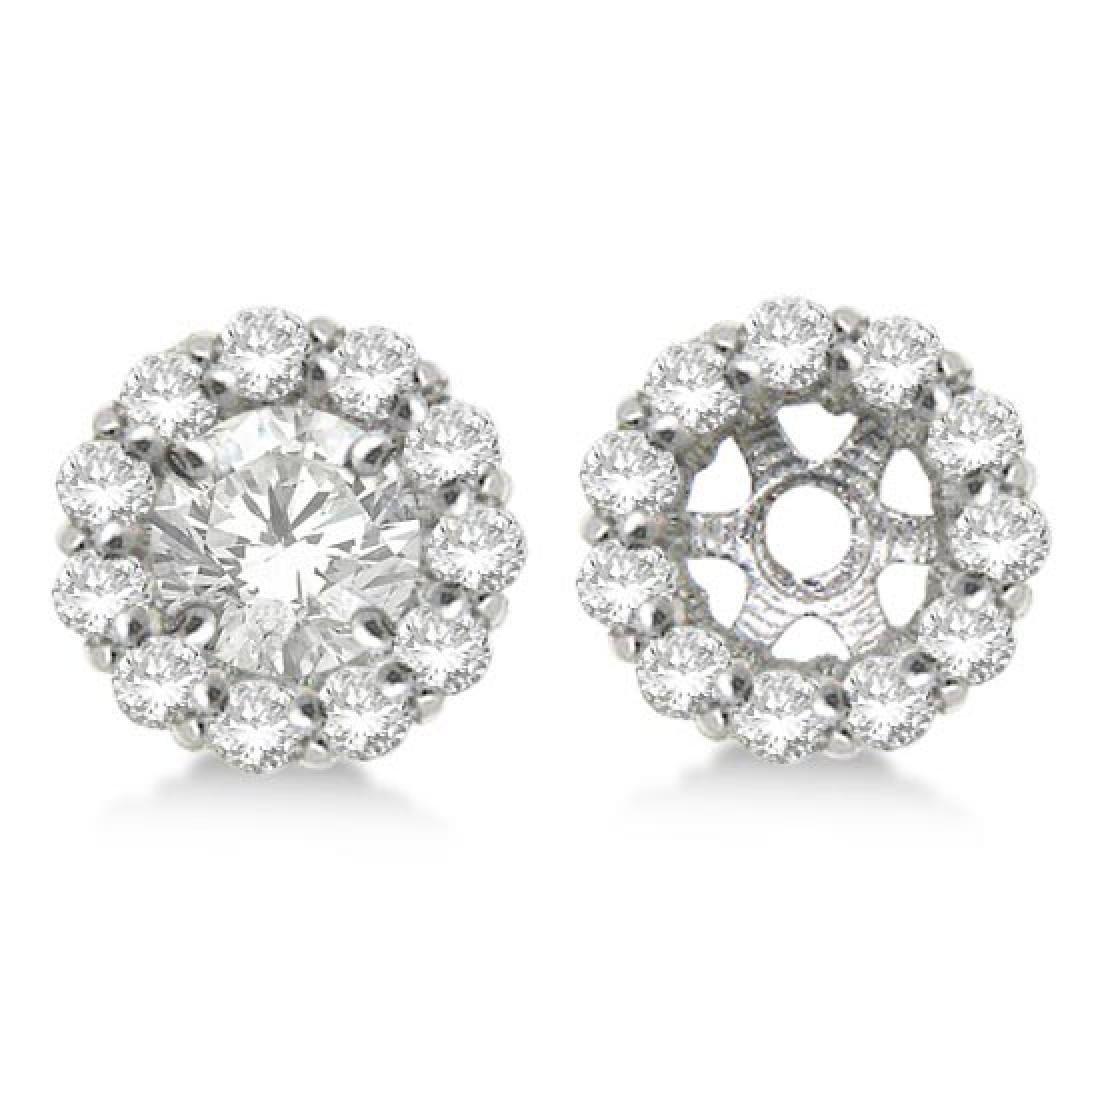 Round Diamond Earring Jackets for 8mm Studs 14K White G